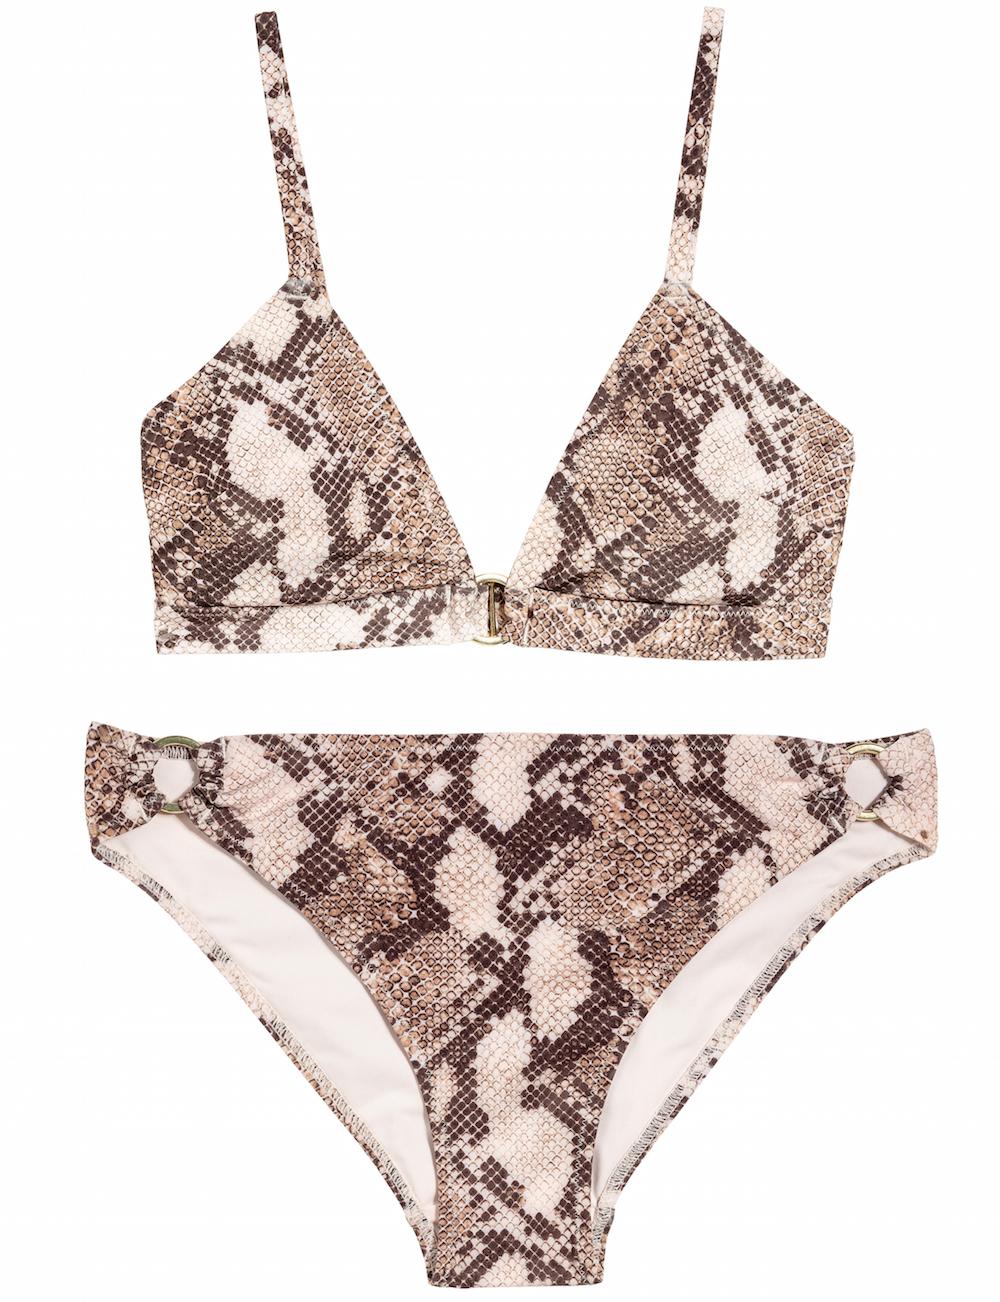 H&M Padded Triangle Bikini